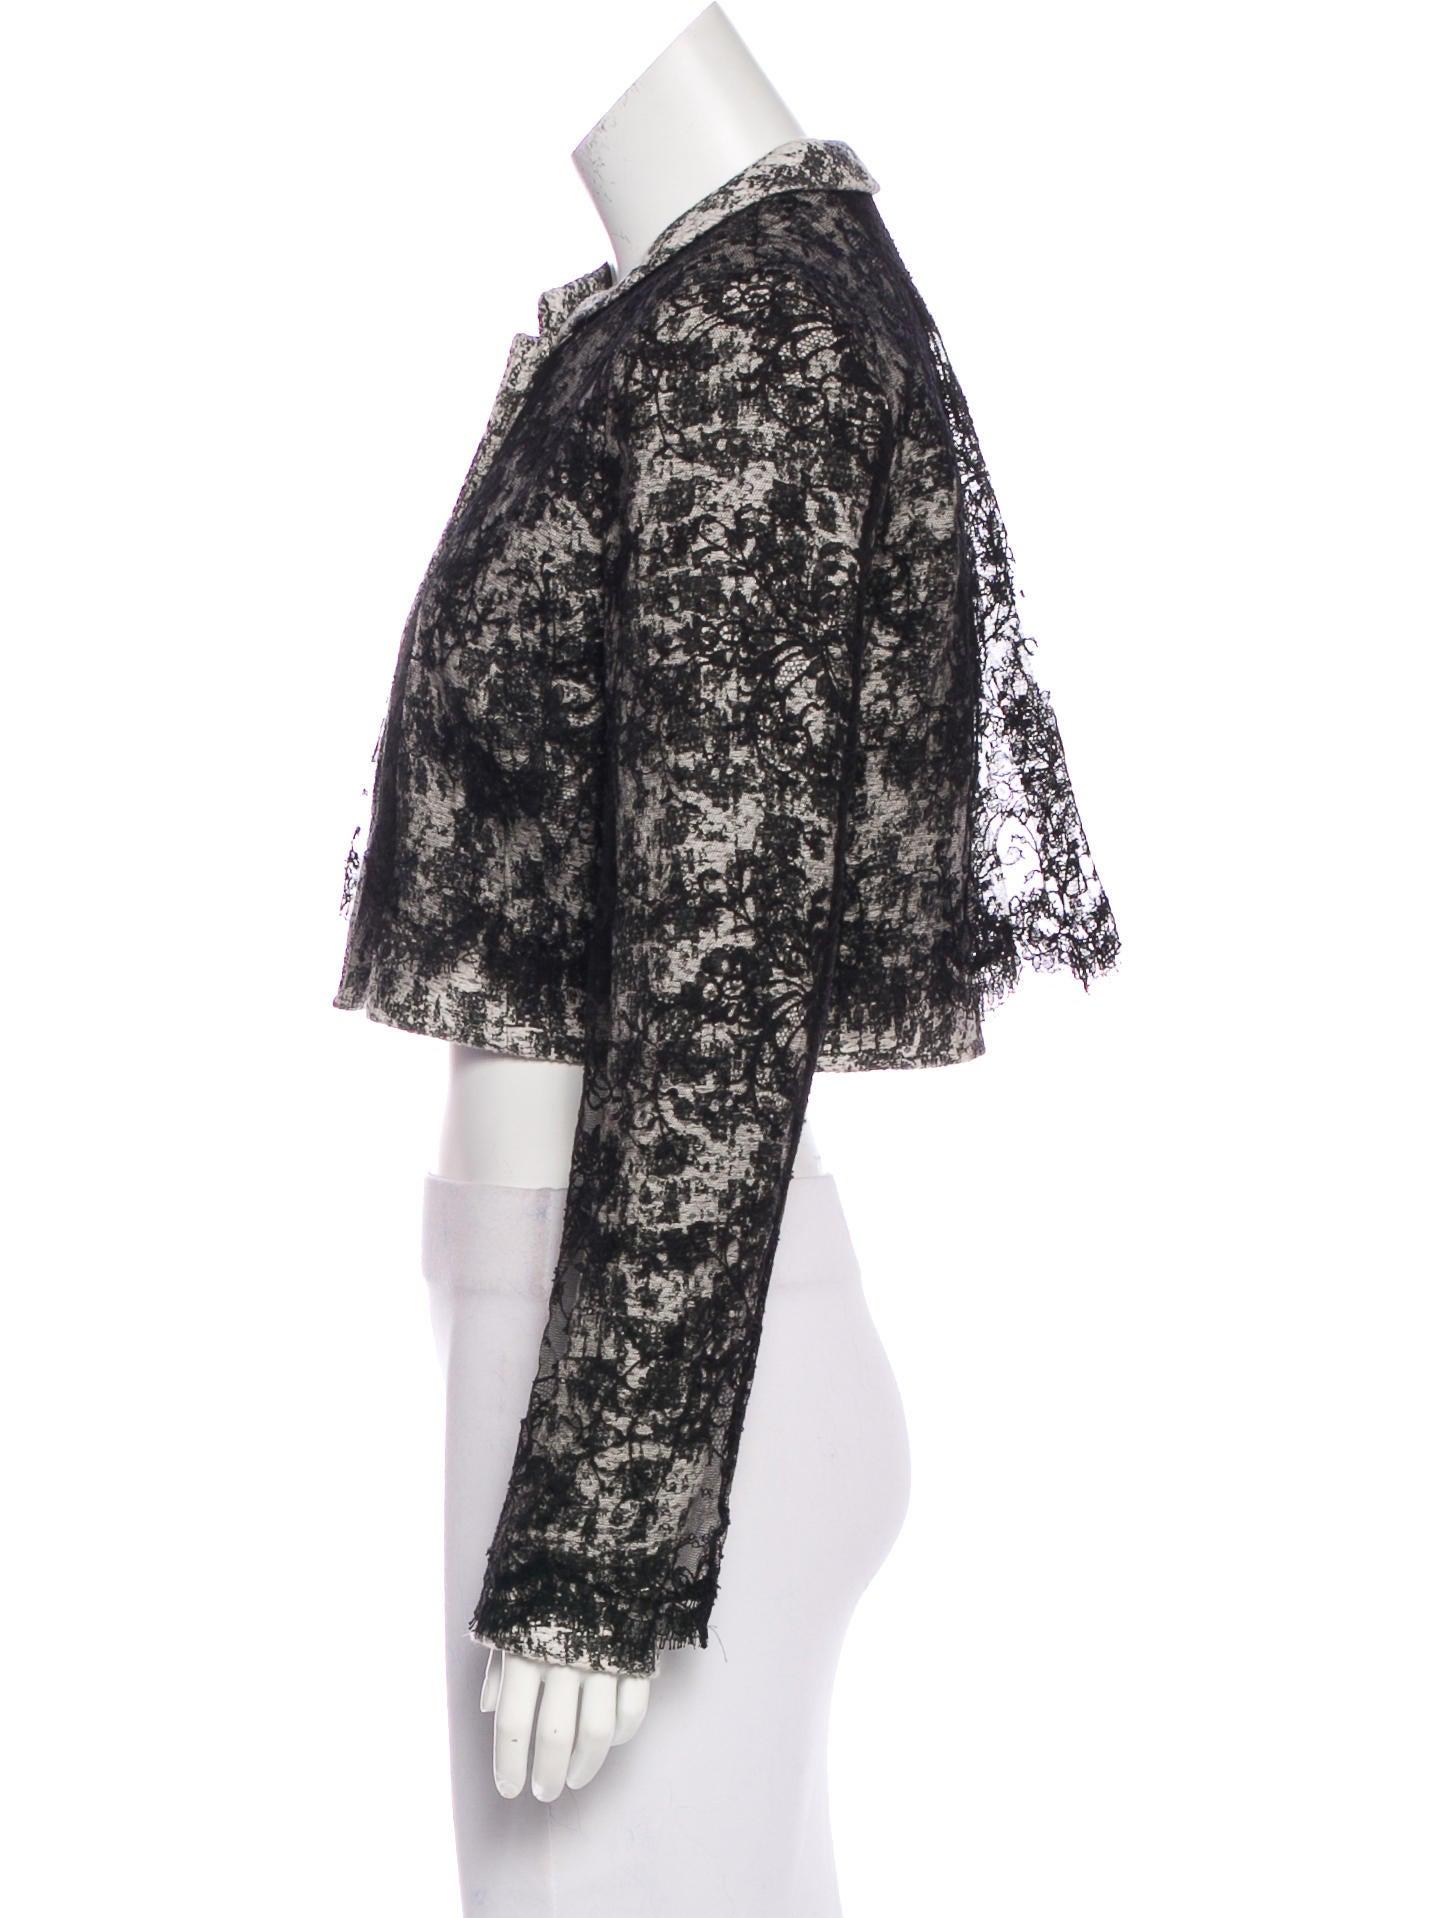 Oscar de la renta 2015 lace jacket clothing osc61590 for Oscar de la renta candles